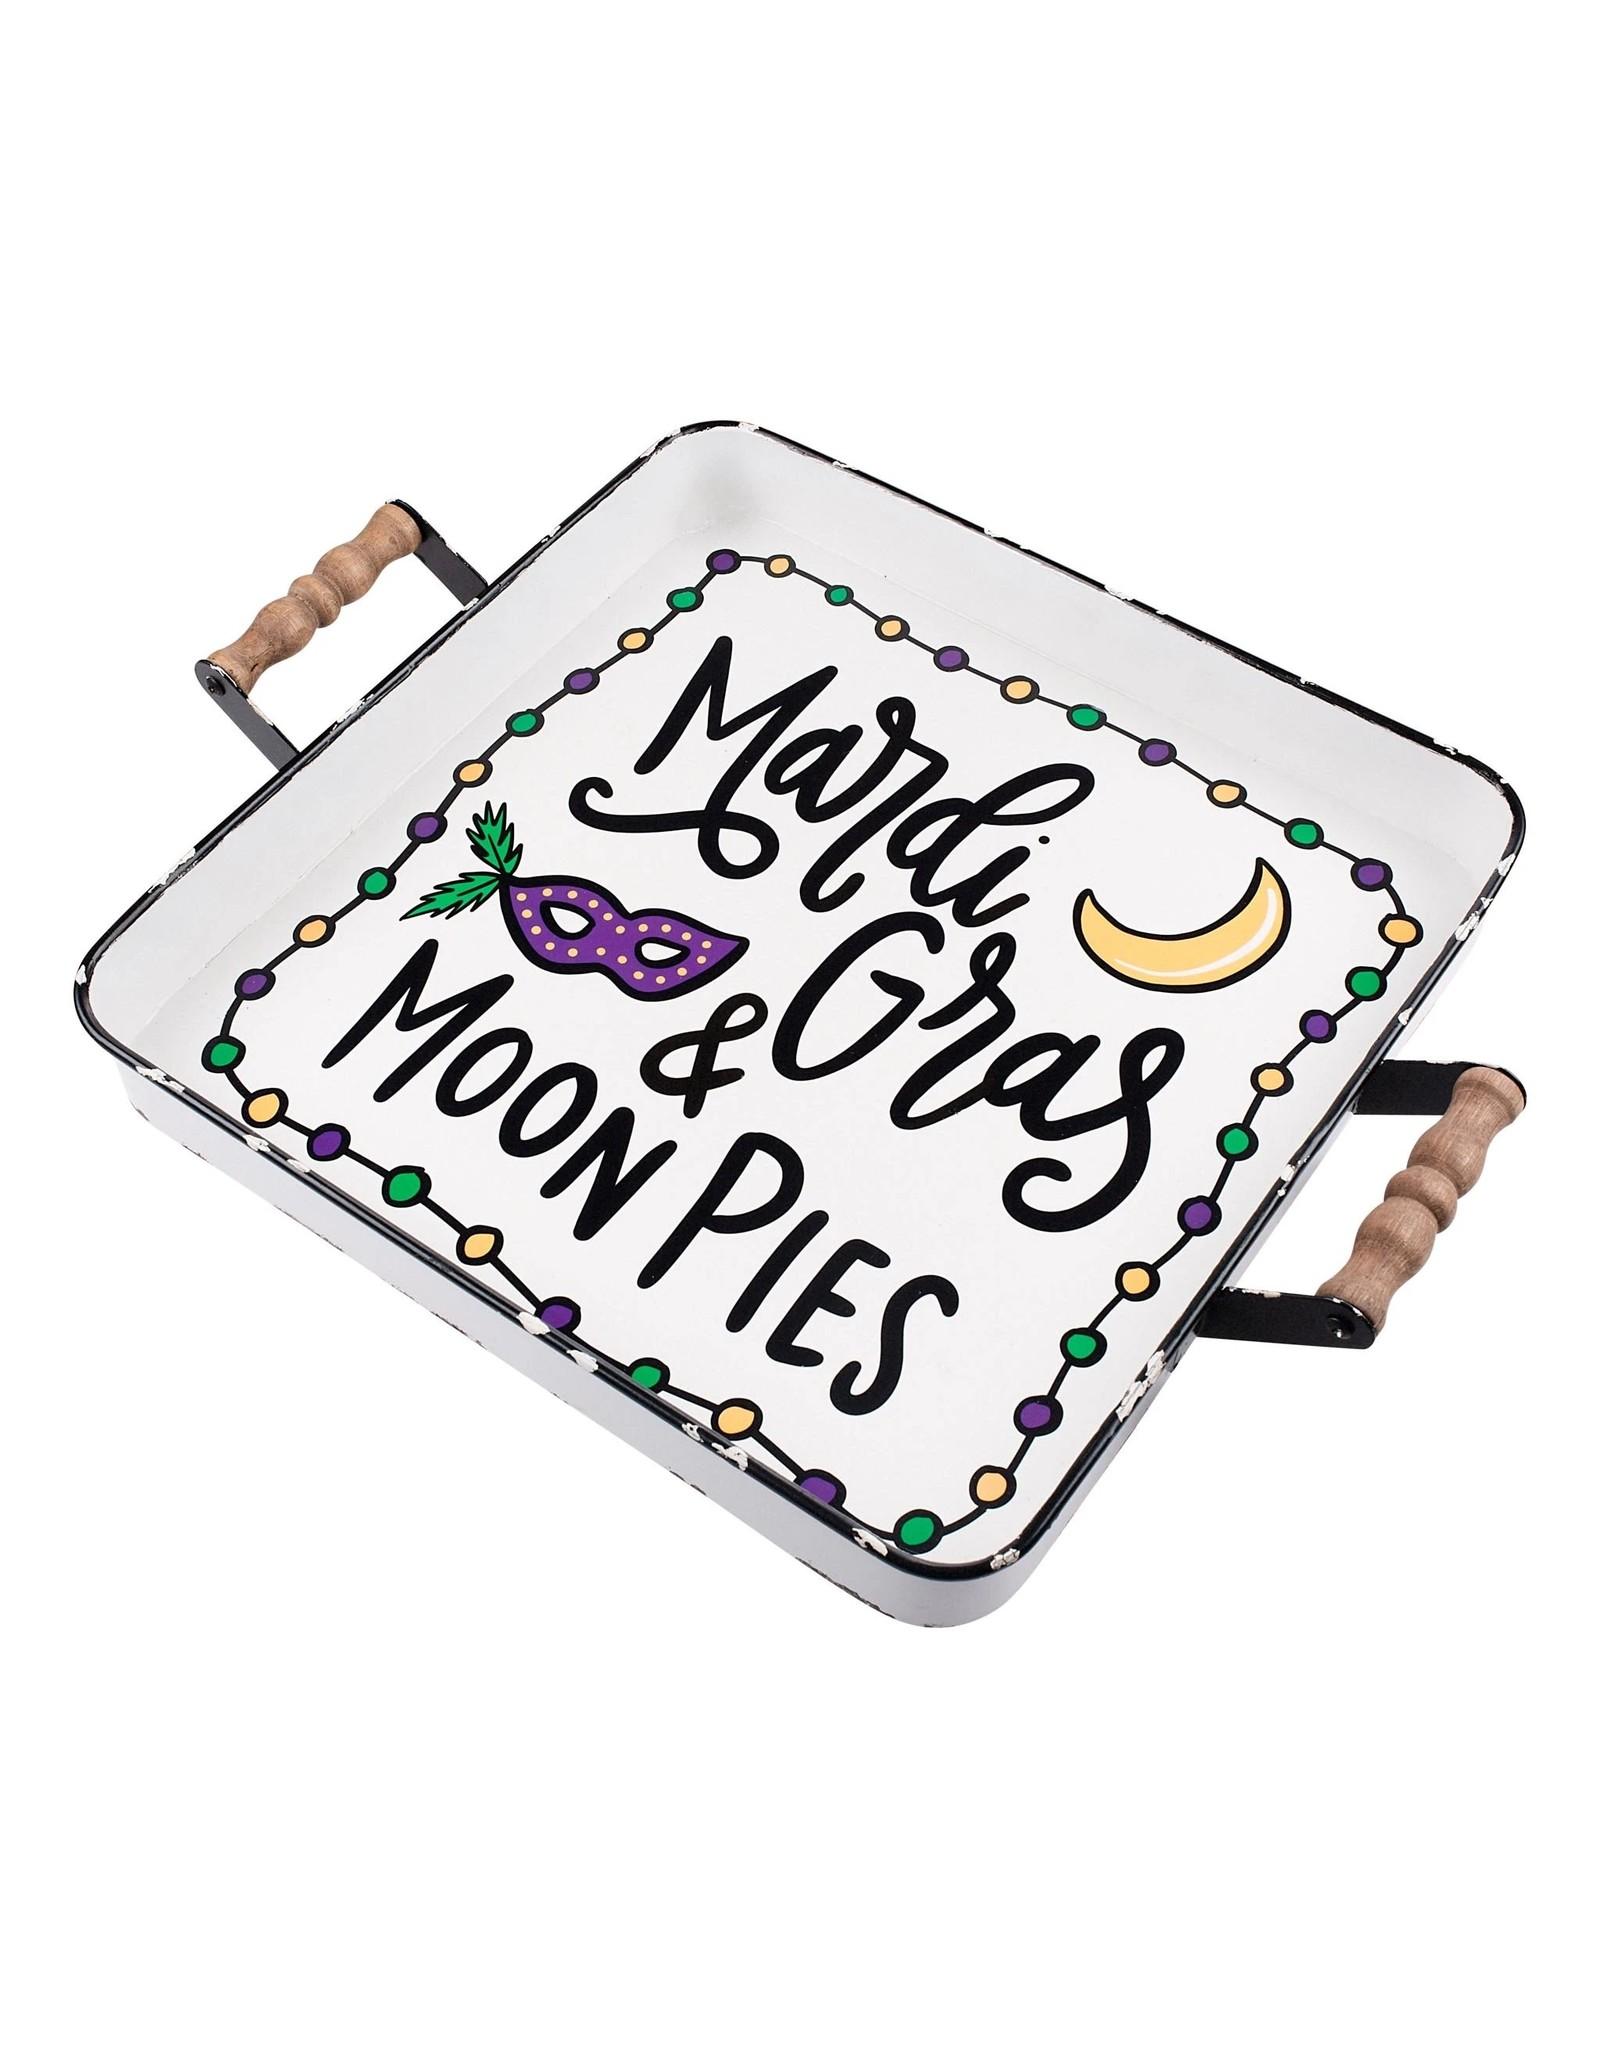 Glory Haus Mardi Gras & Moon Pies Enamel Tray